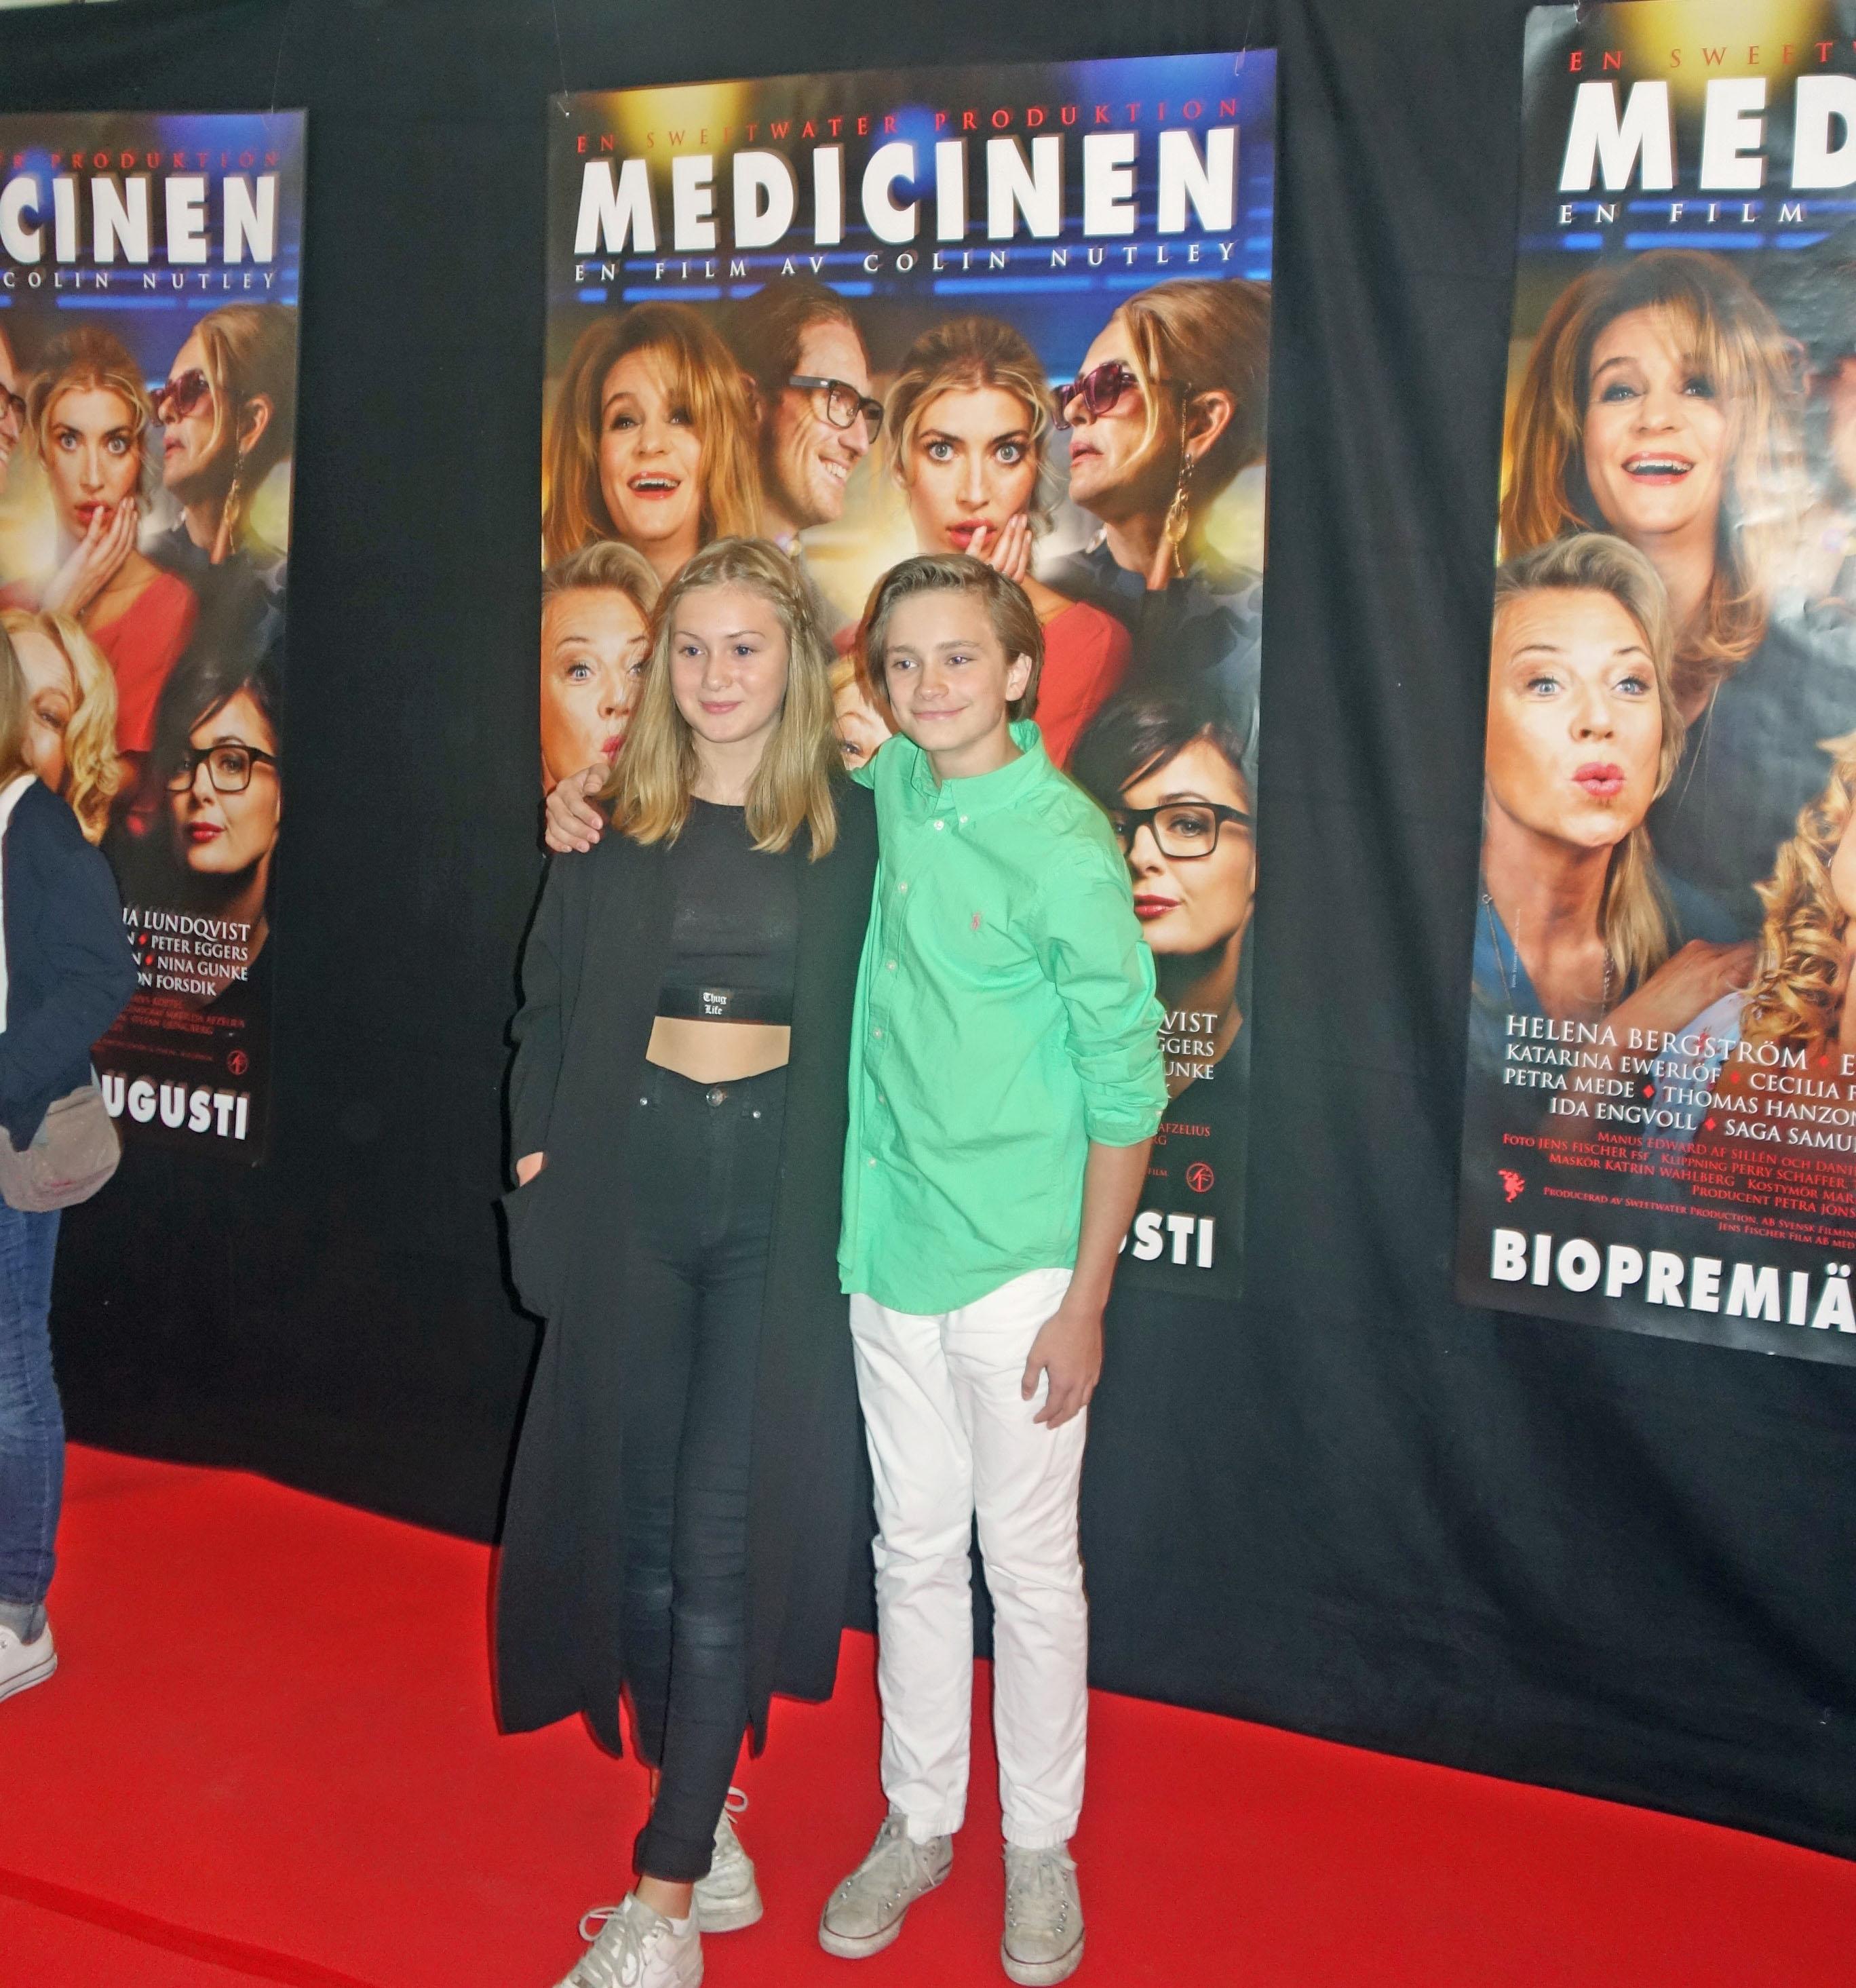 Saga Samuelsson and Anton Forsdik at an event for Medicinen (2014)